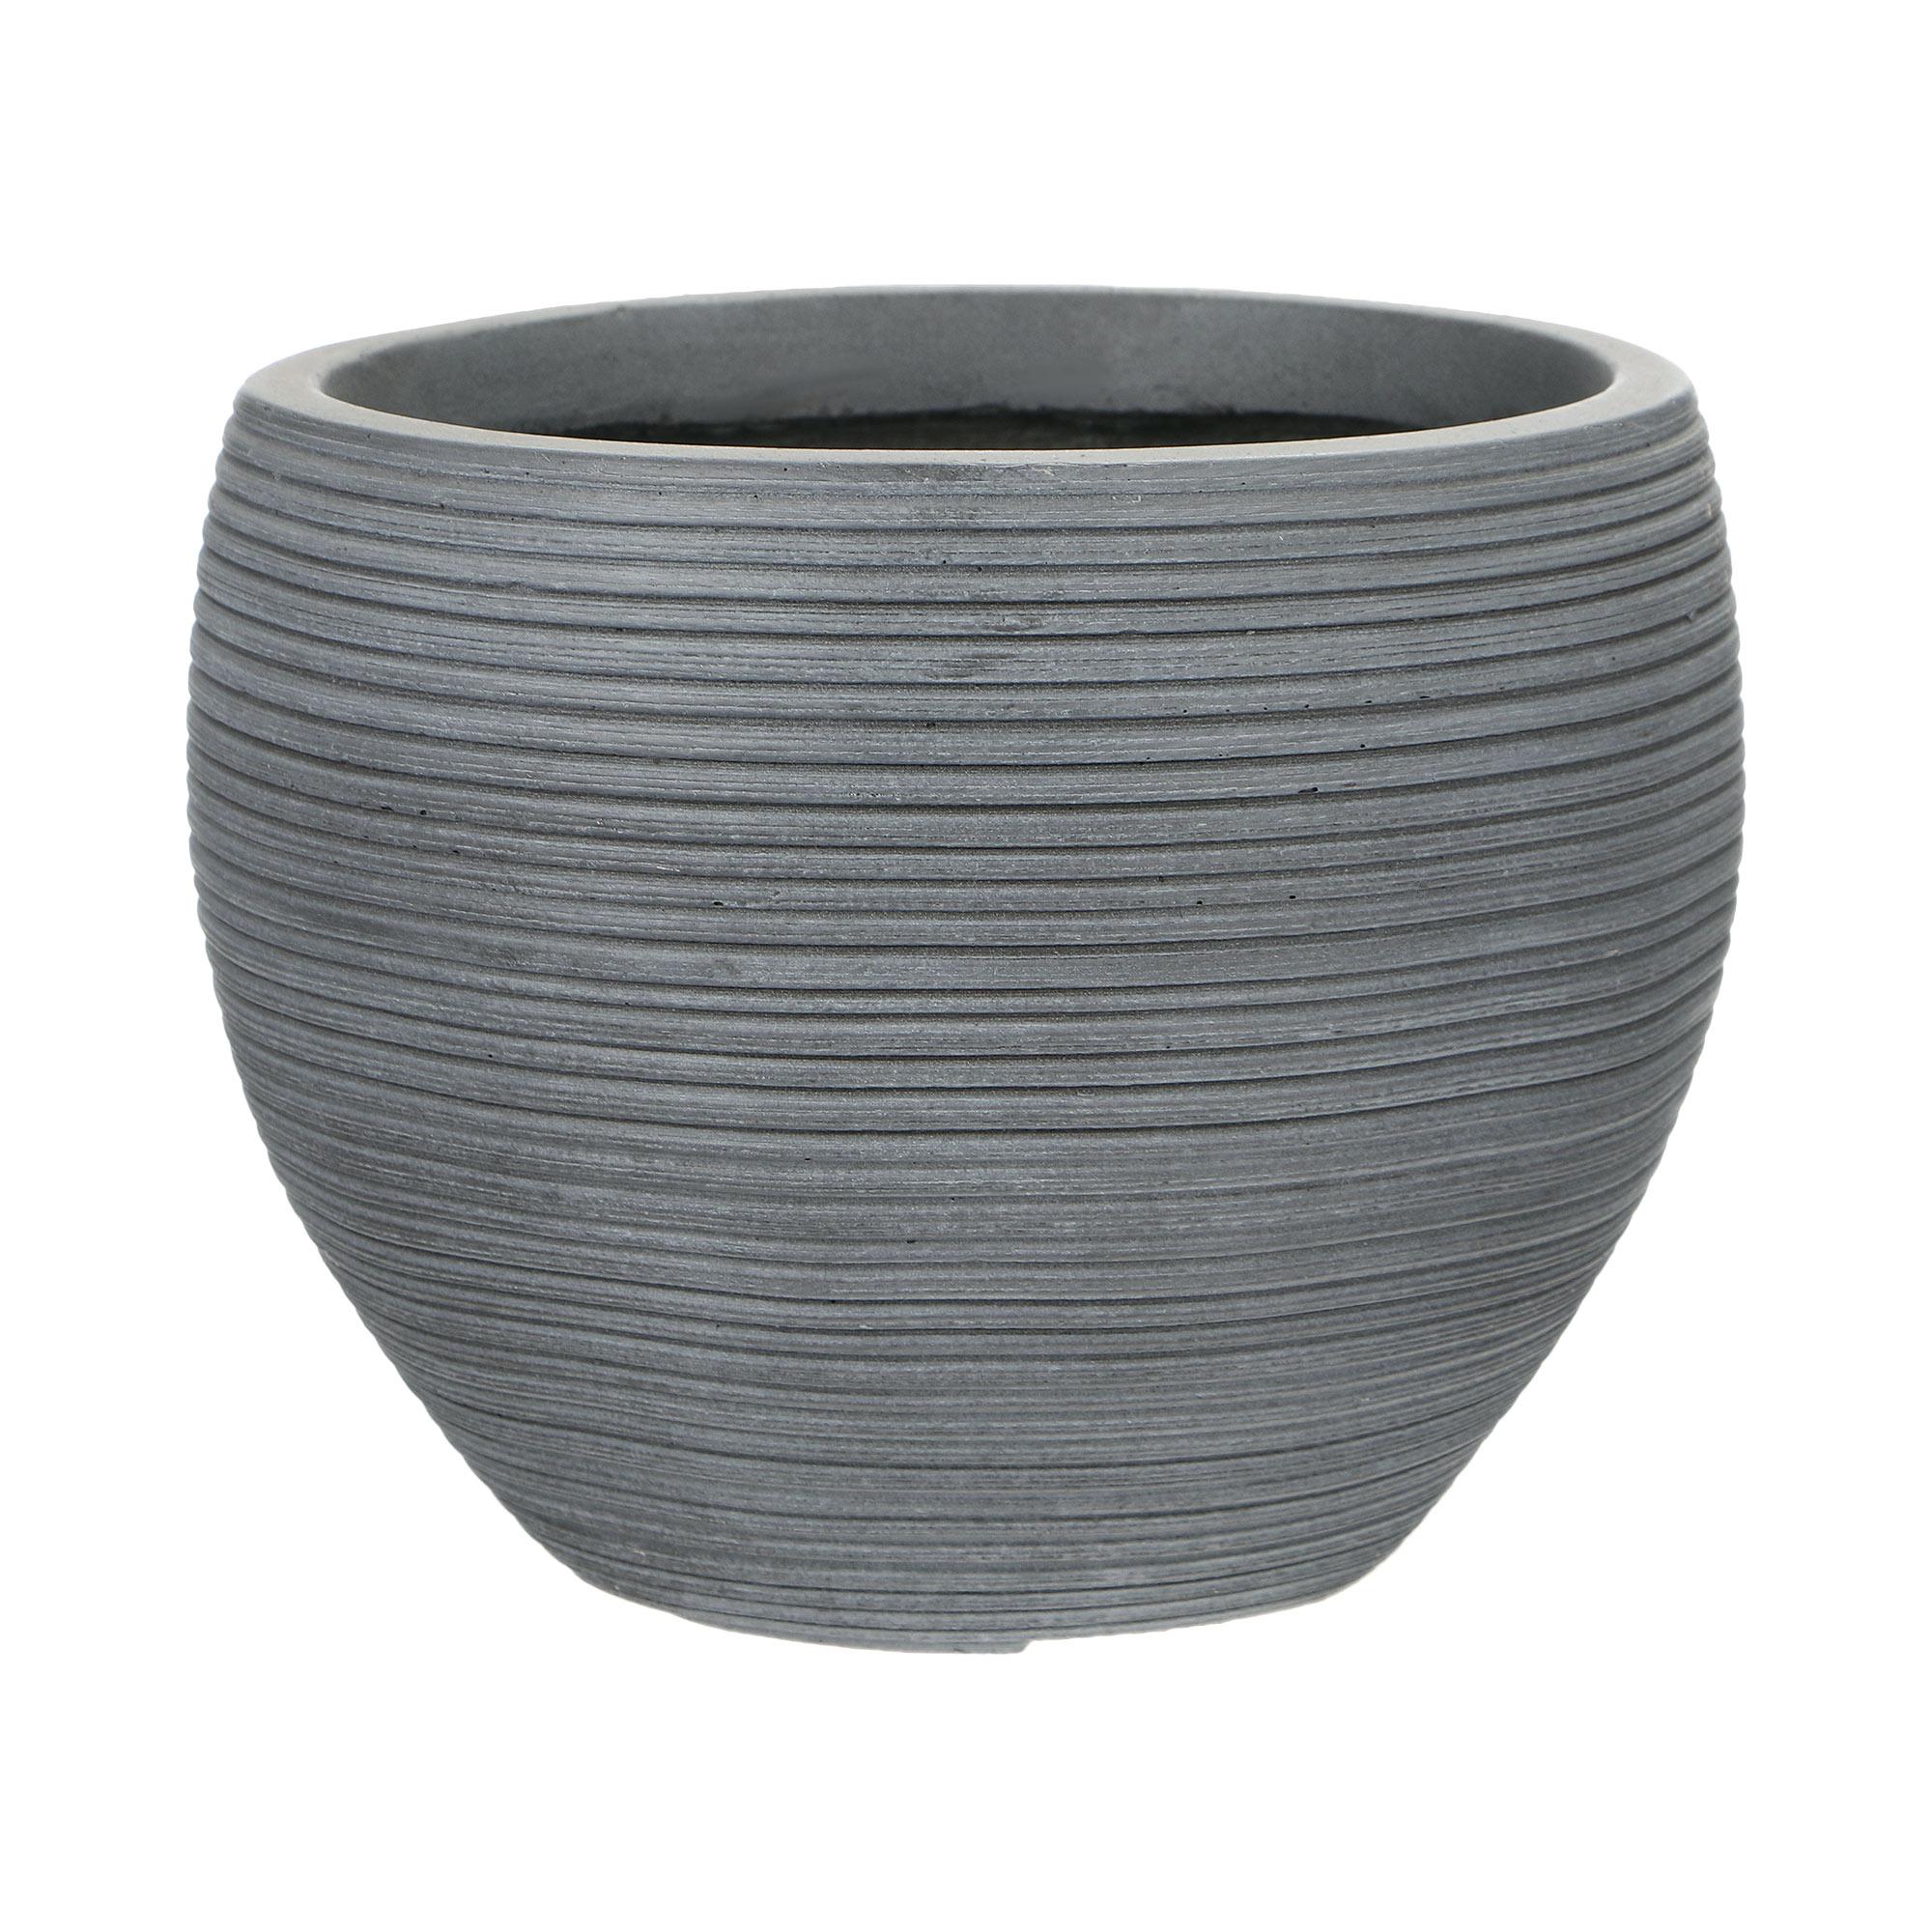 Горшок для цветов L&t pottery темно-серый d28.5